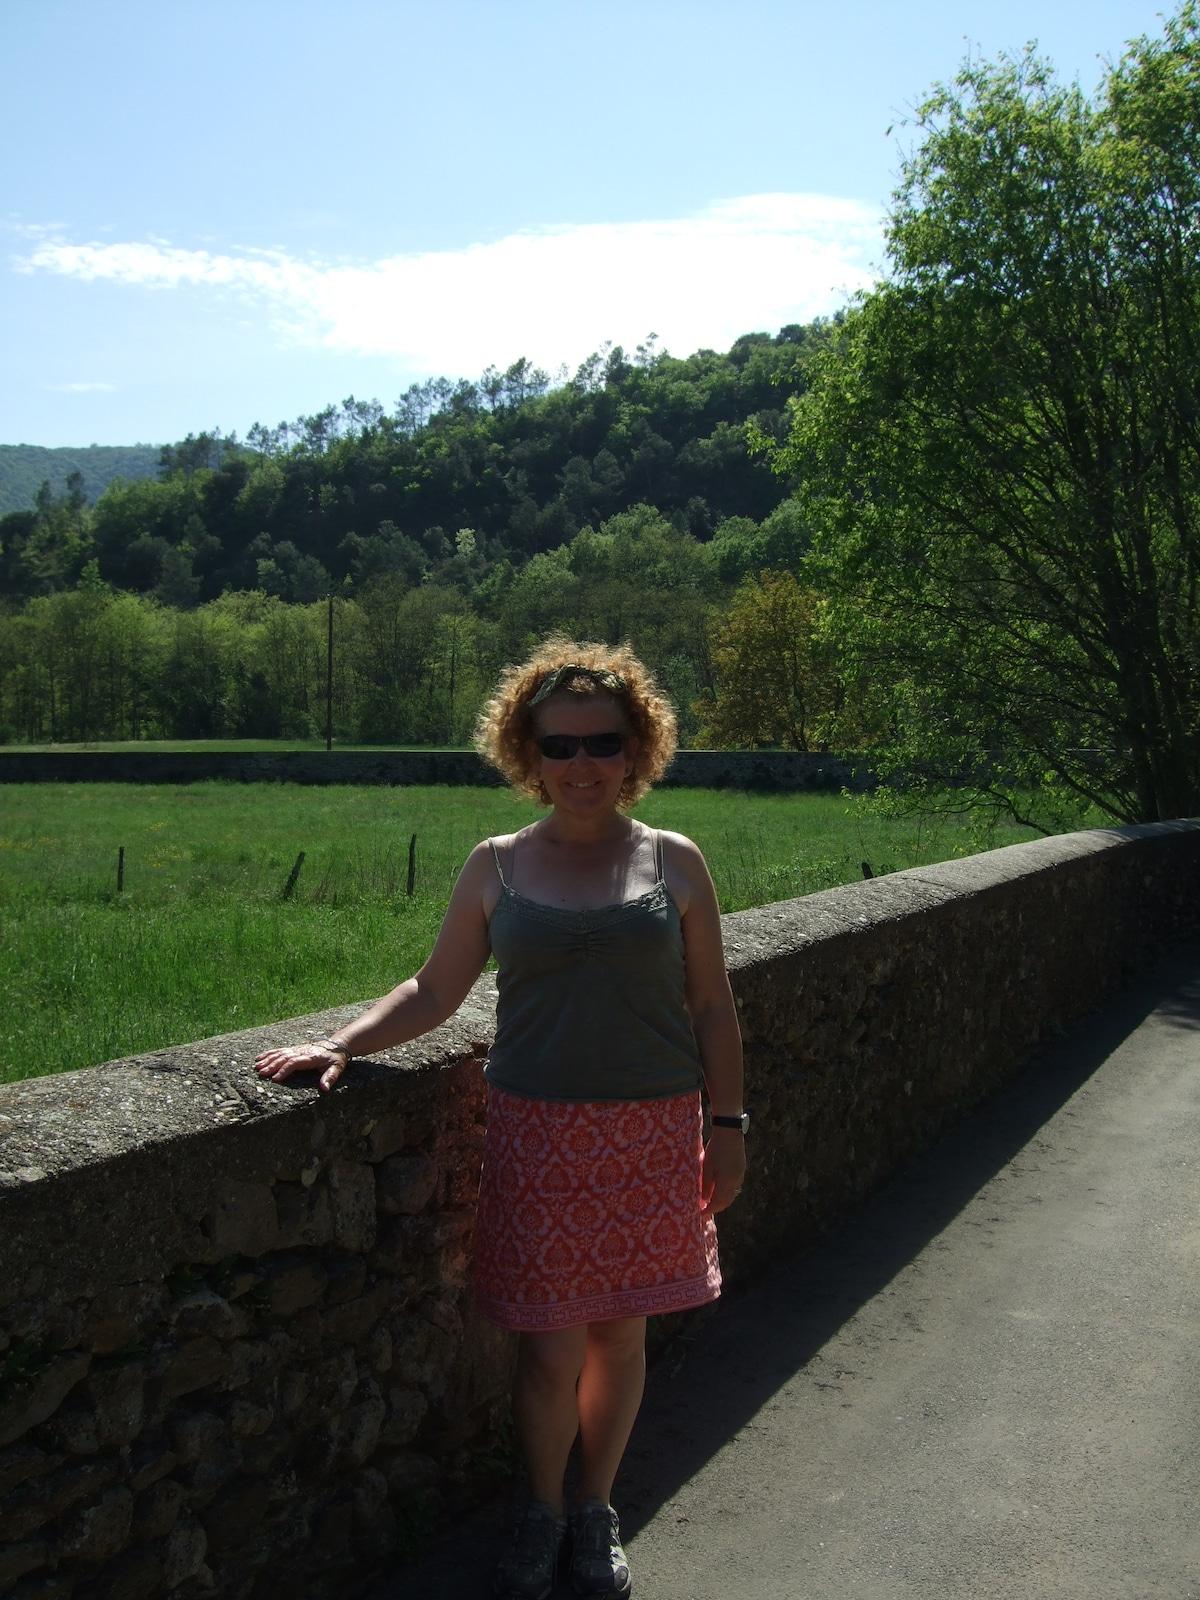 Amanda from Sedgehill